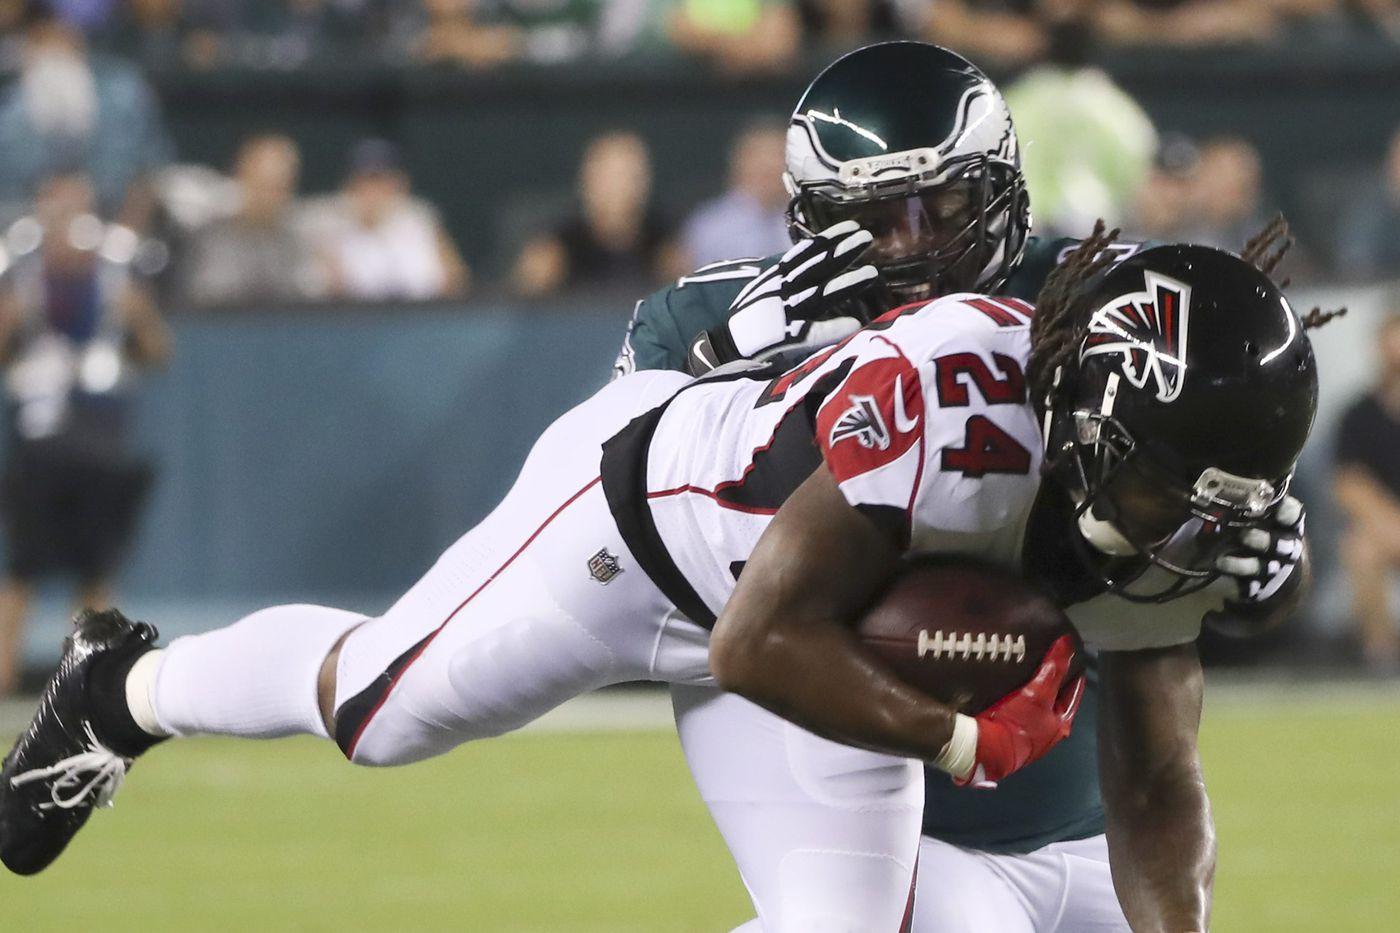 Eagles' Fletcher Cox and Co. turned up the pass-rush heat on Falcons' Matt Ryan